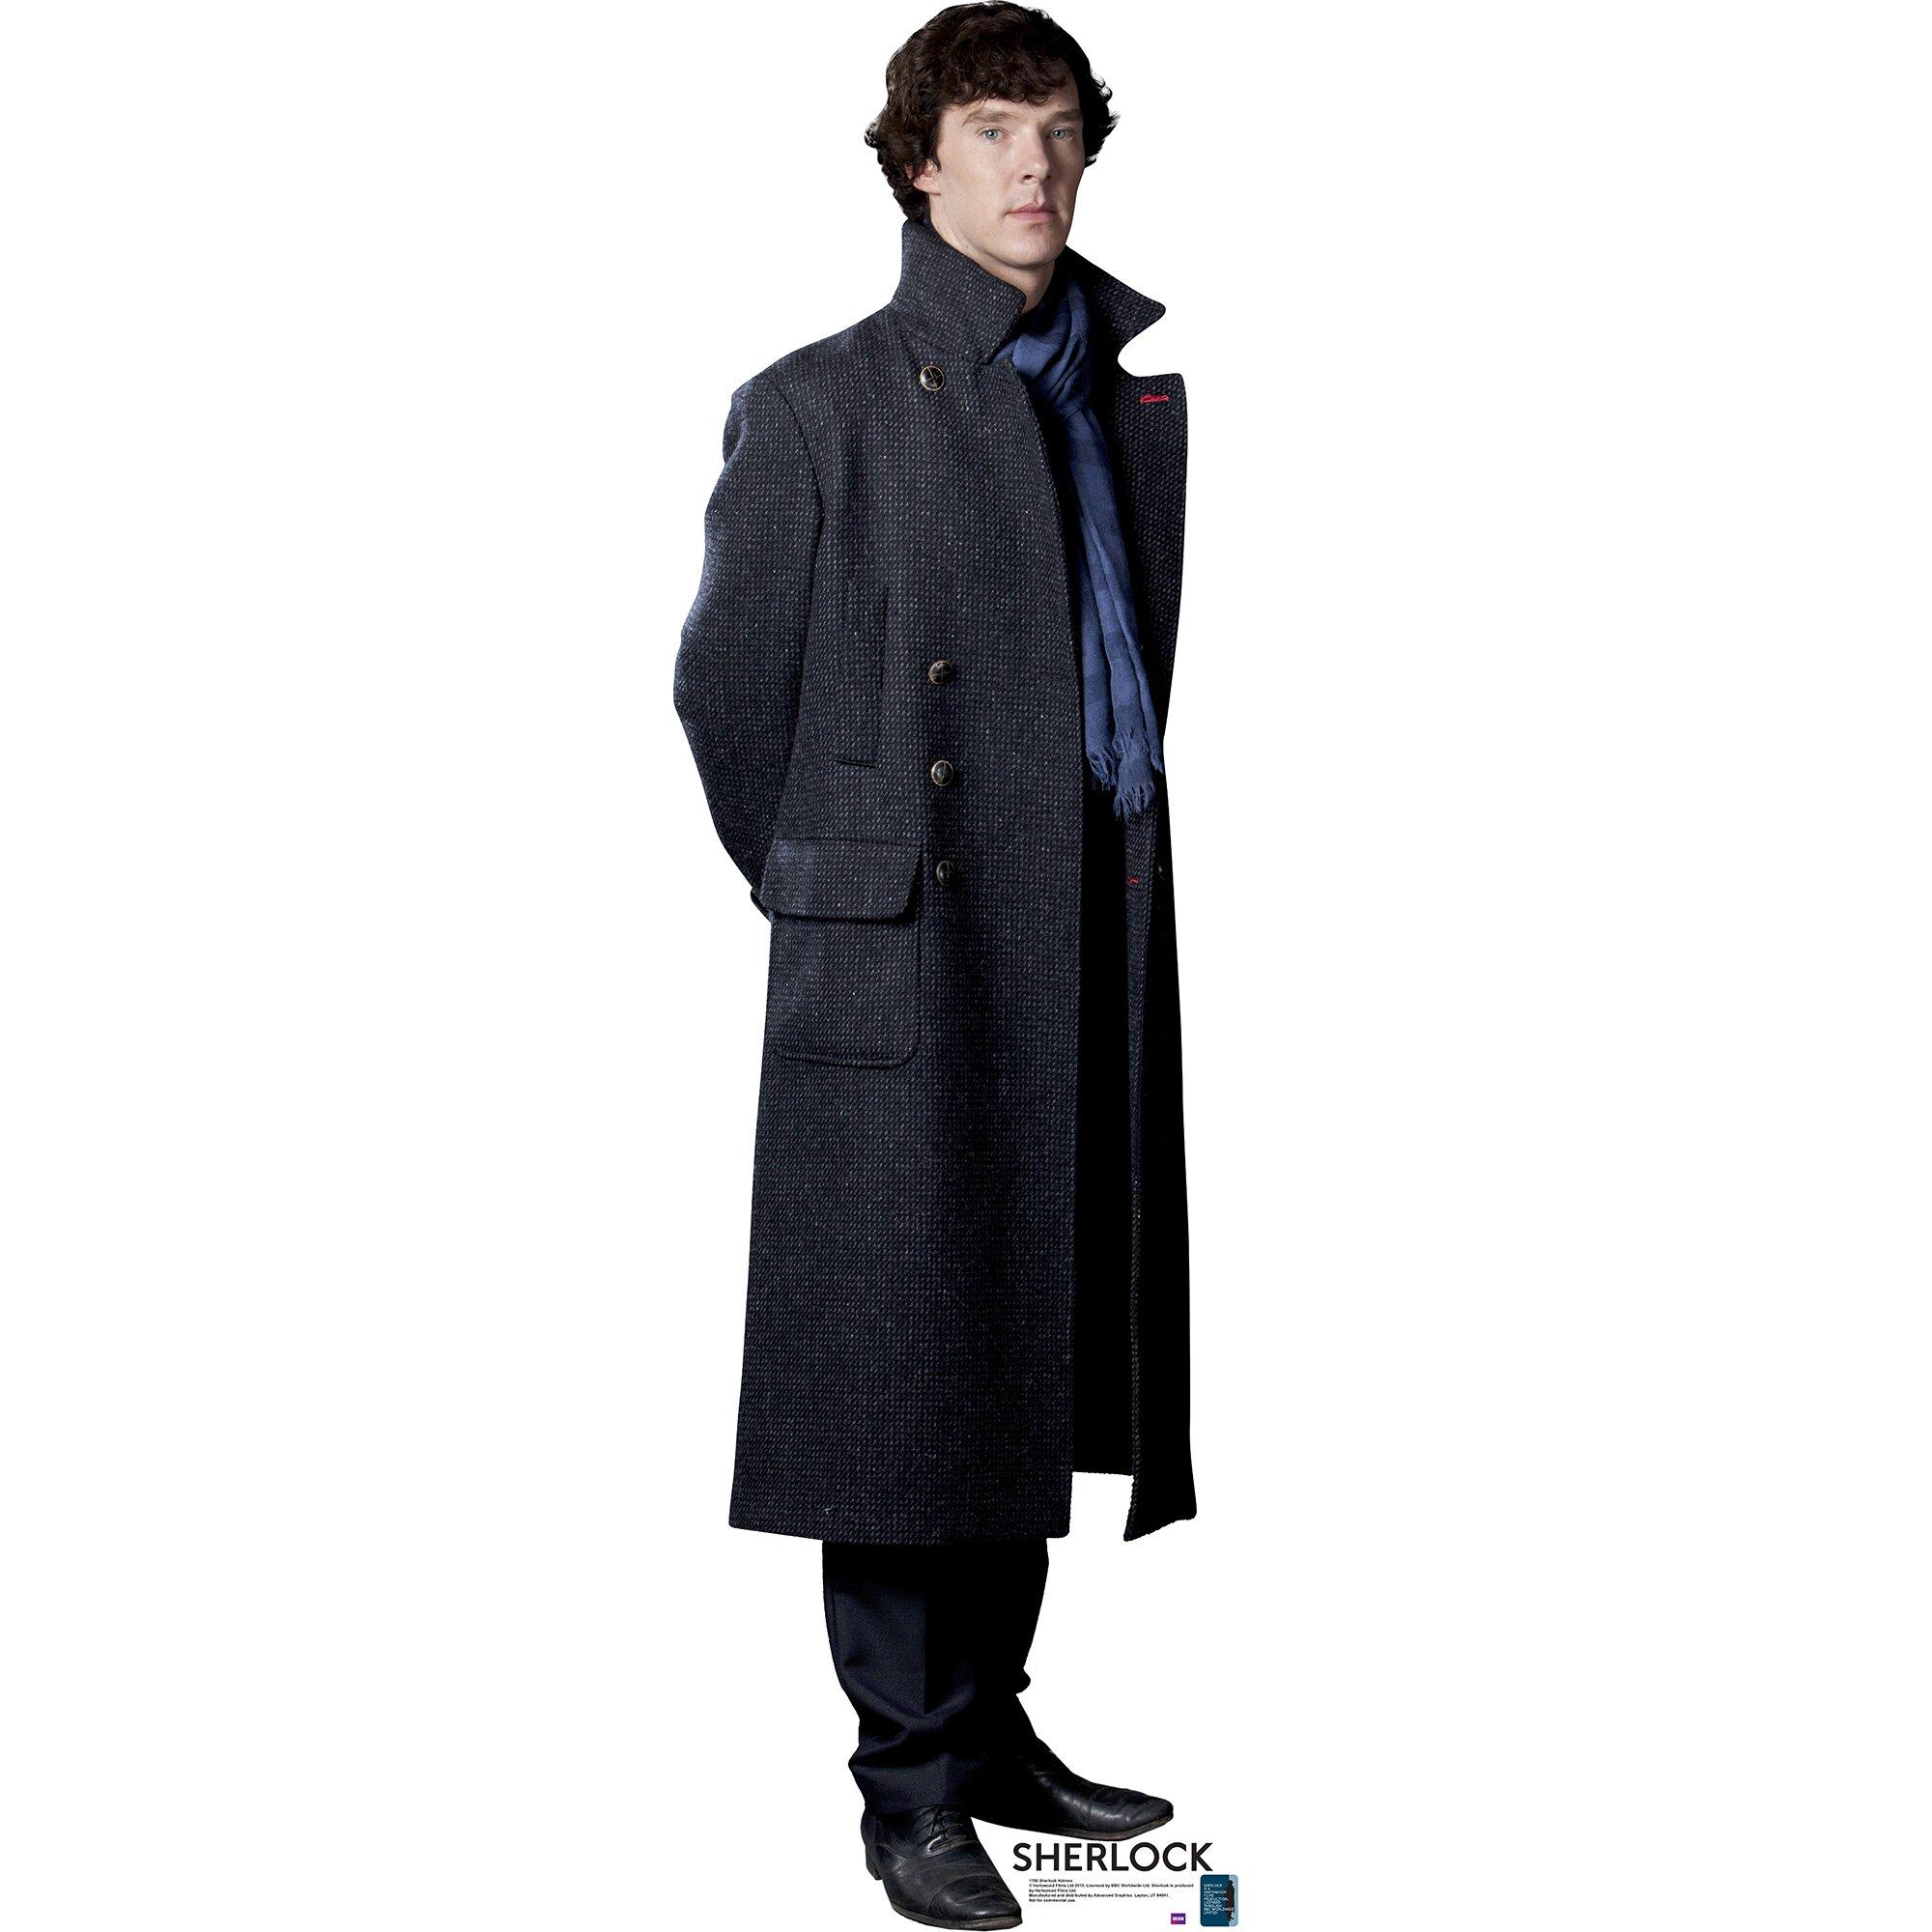 Advanced Graphics BBC's Sherlock Sherlock Holmes Cardboard ...